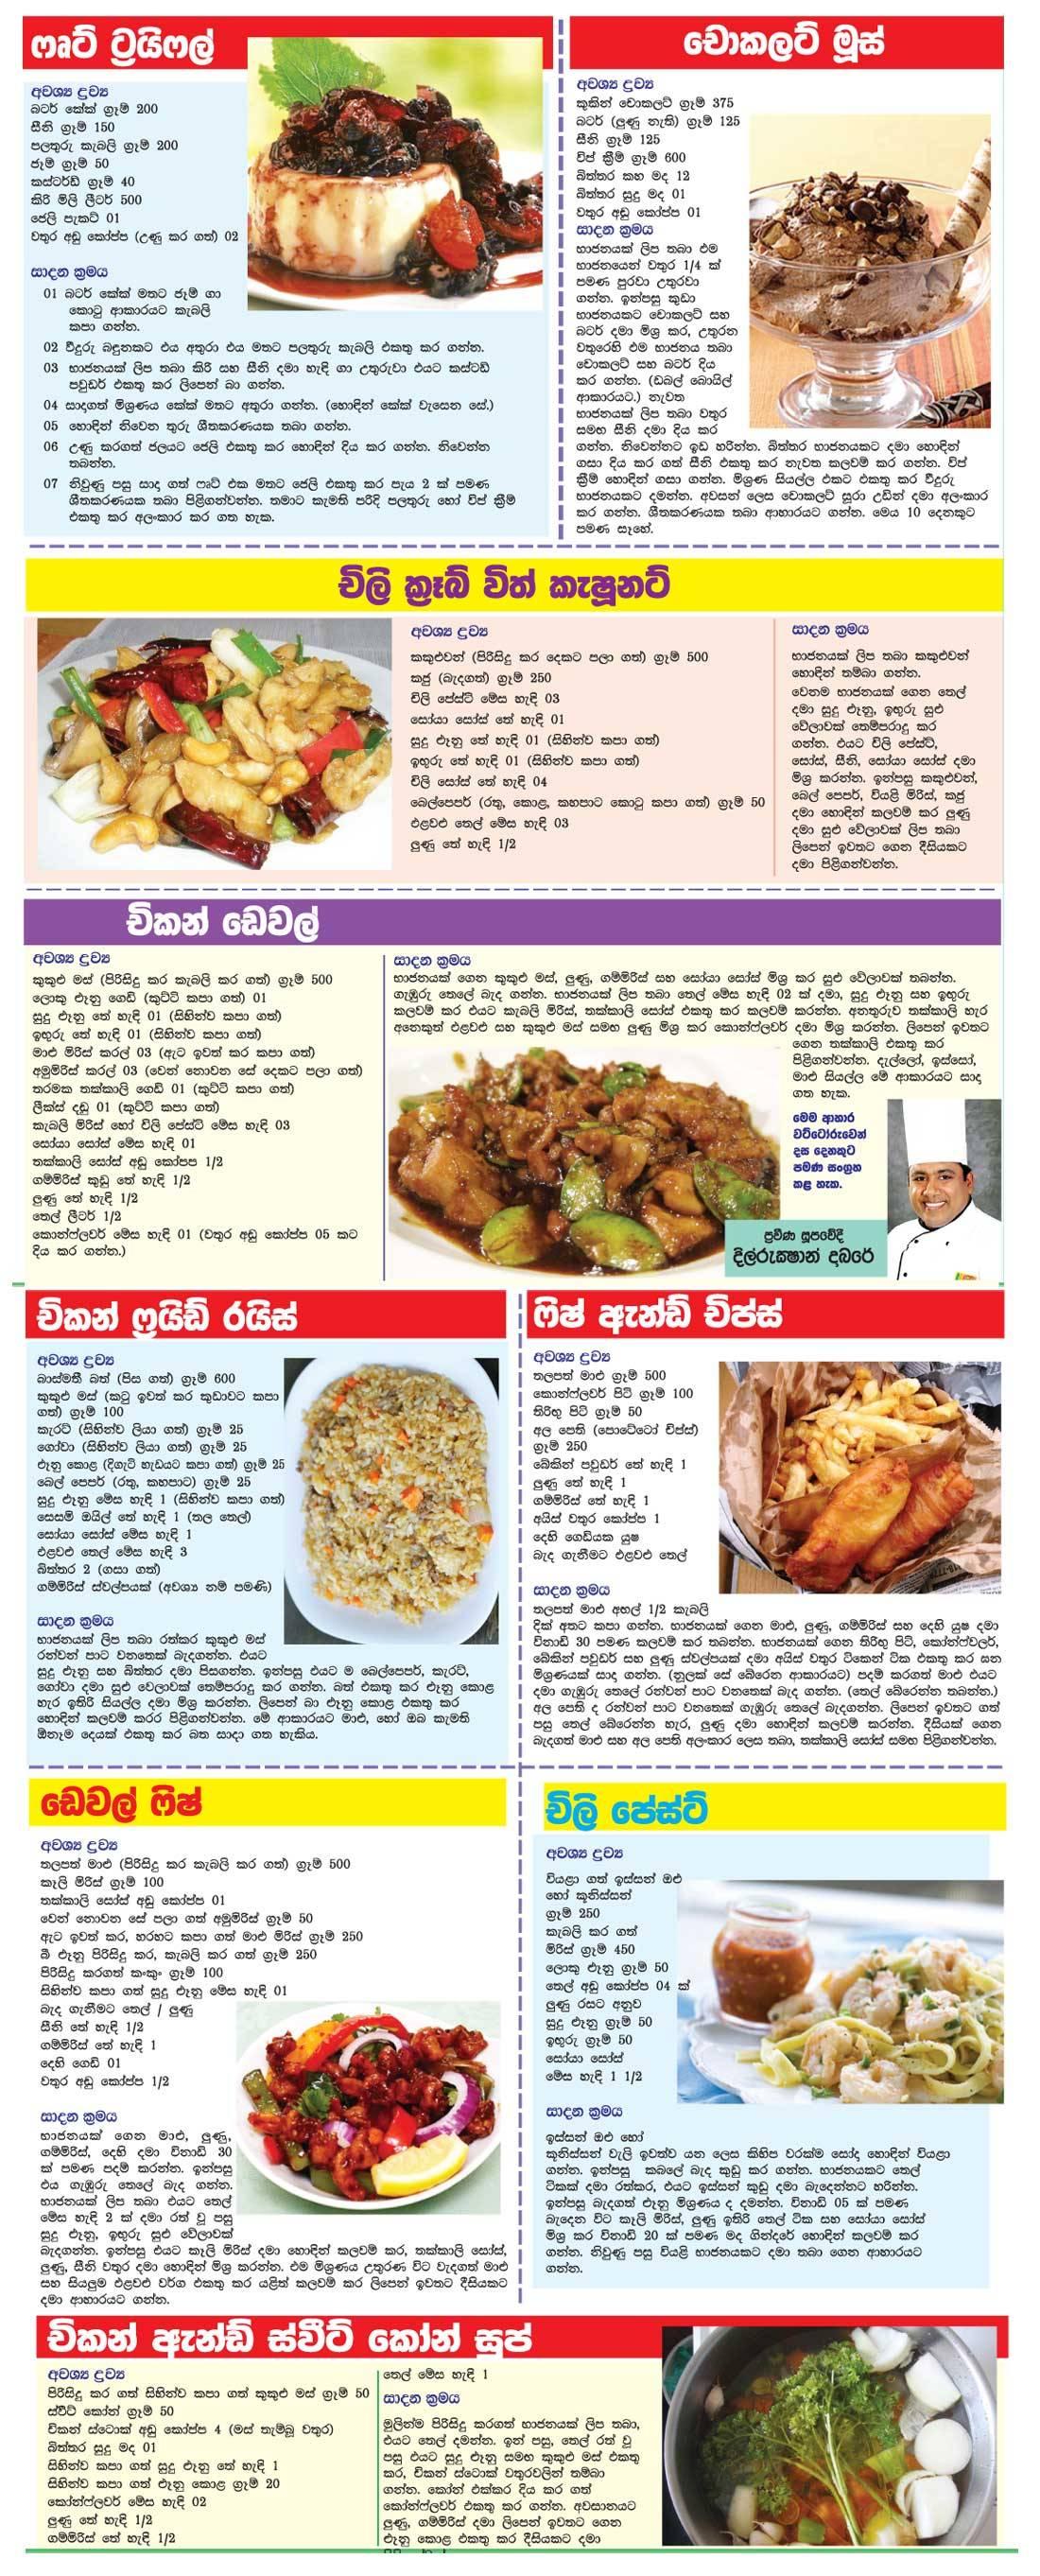 20 Fantastic Ideas Sinhala Language Wedding Cake Recipes Sinhala Boudoir Paris